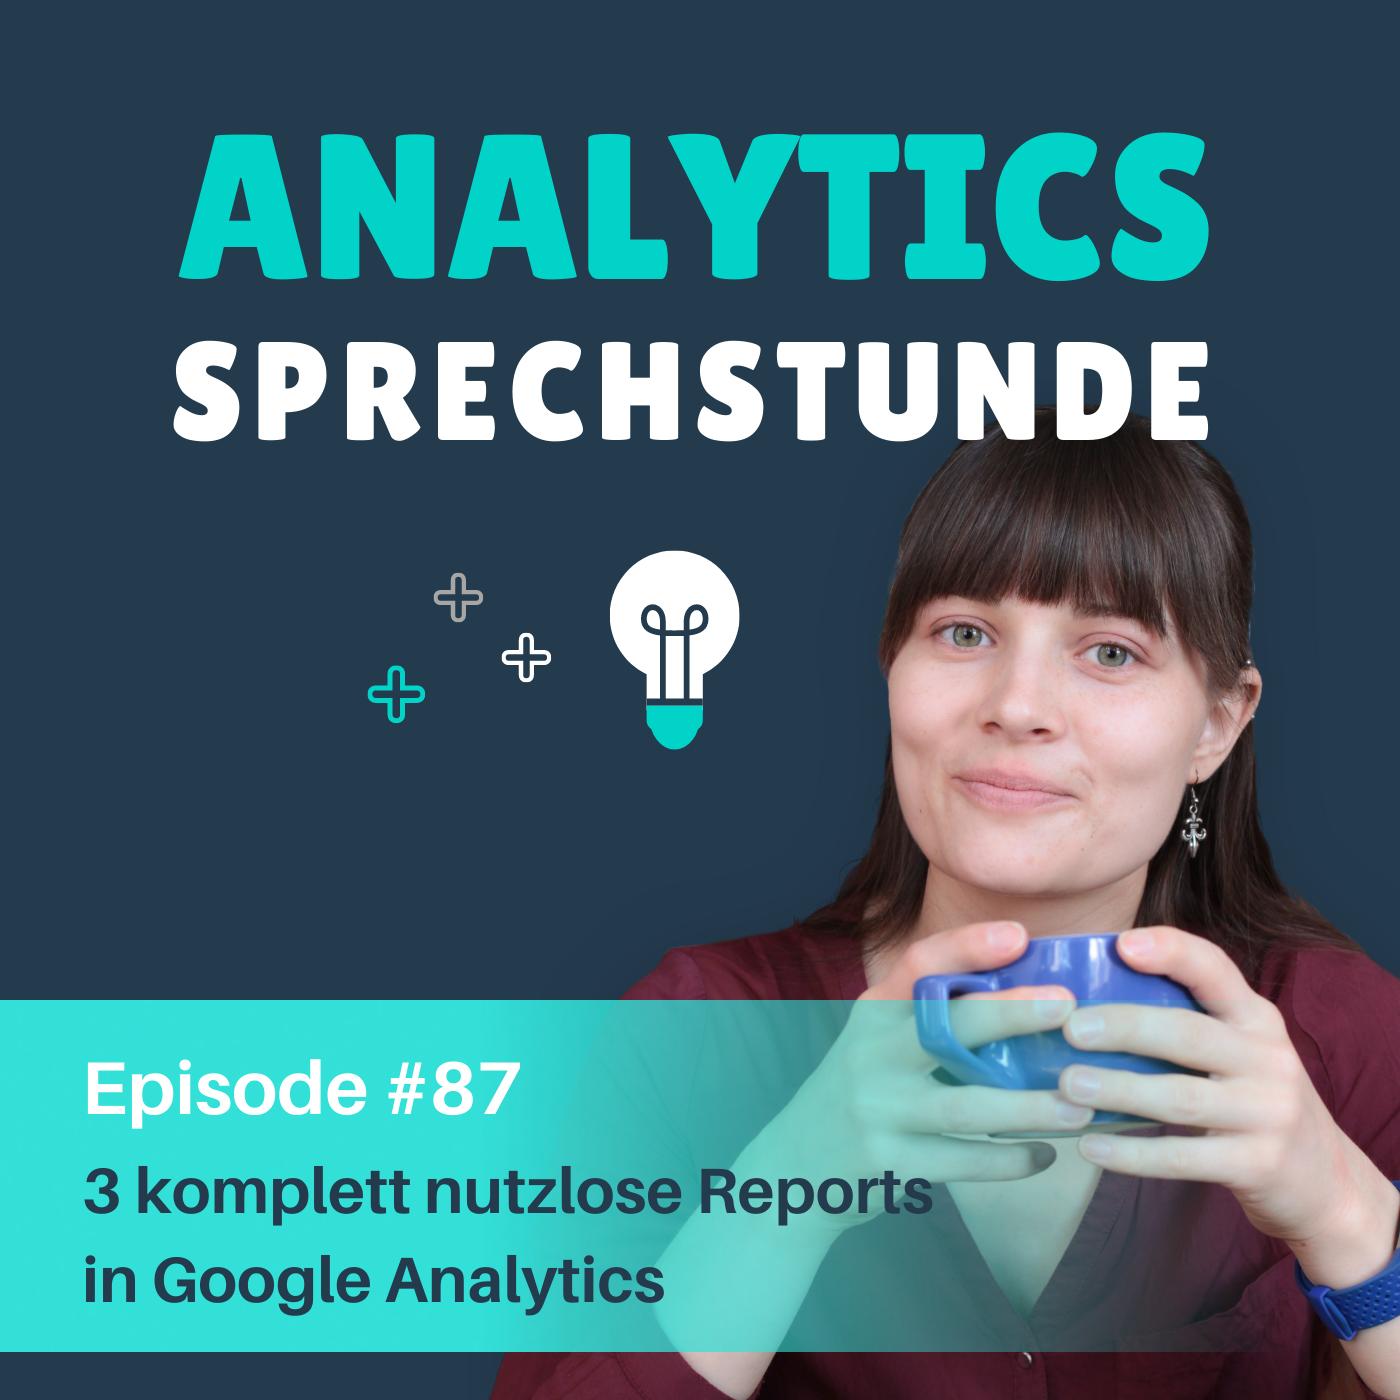 87 3 komplett nutzlose Reports in Google Analytics